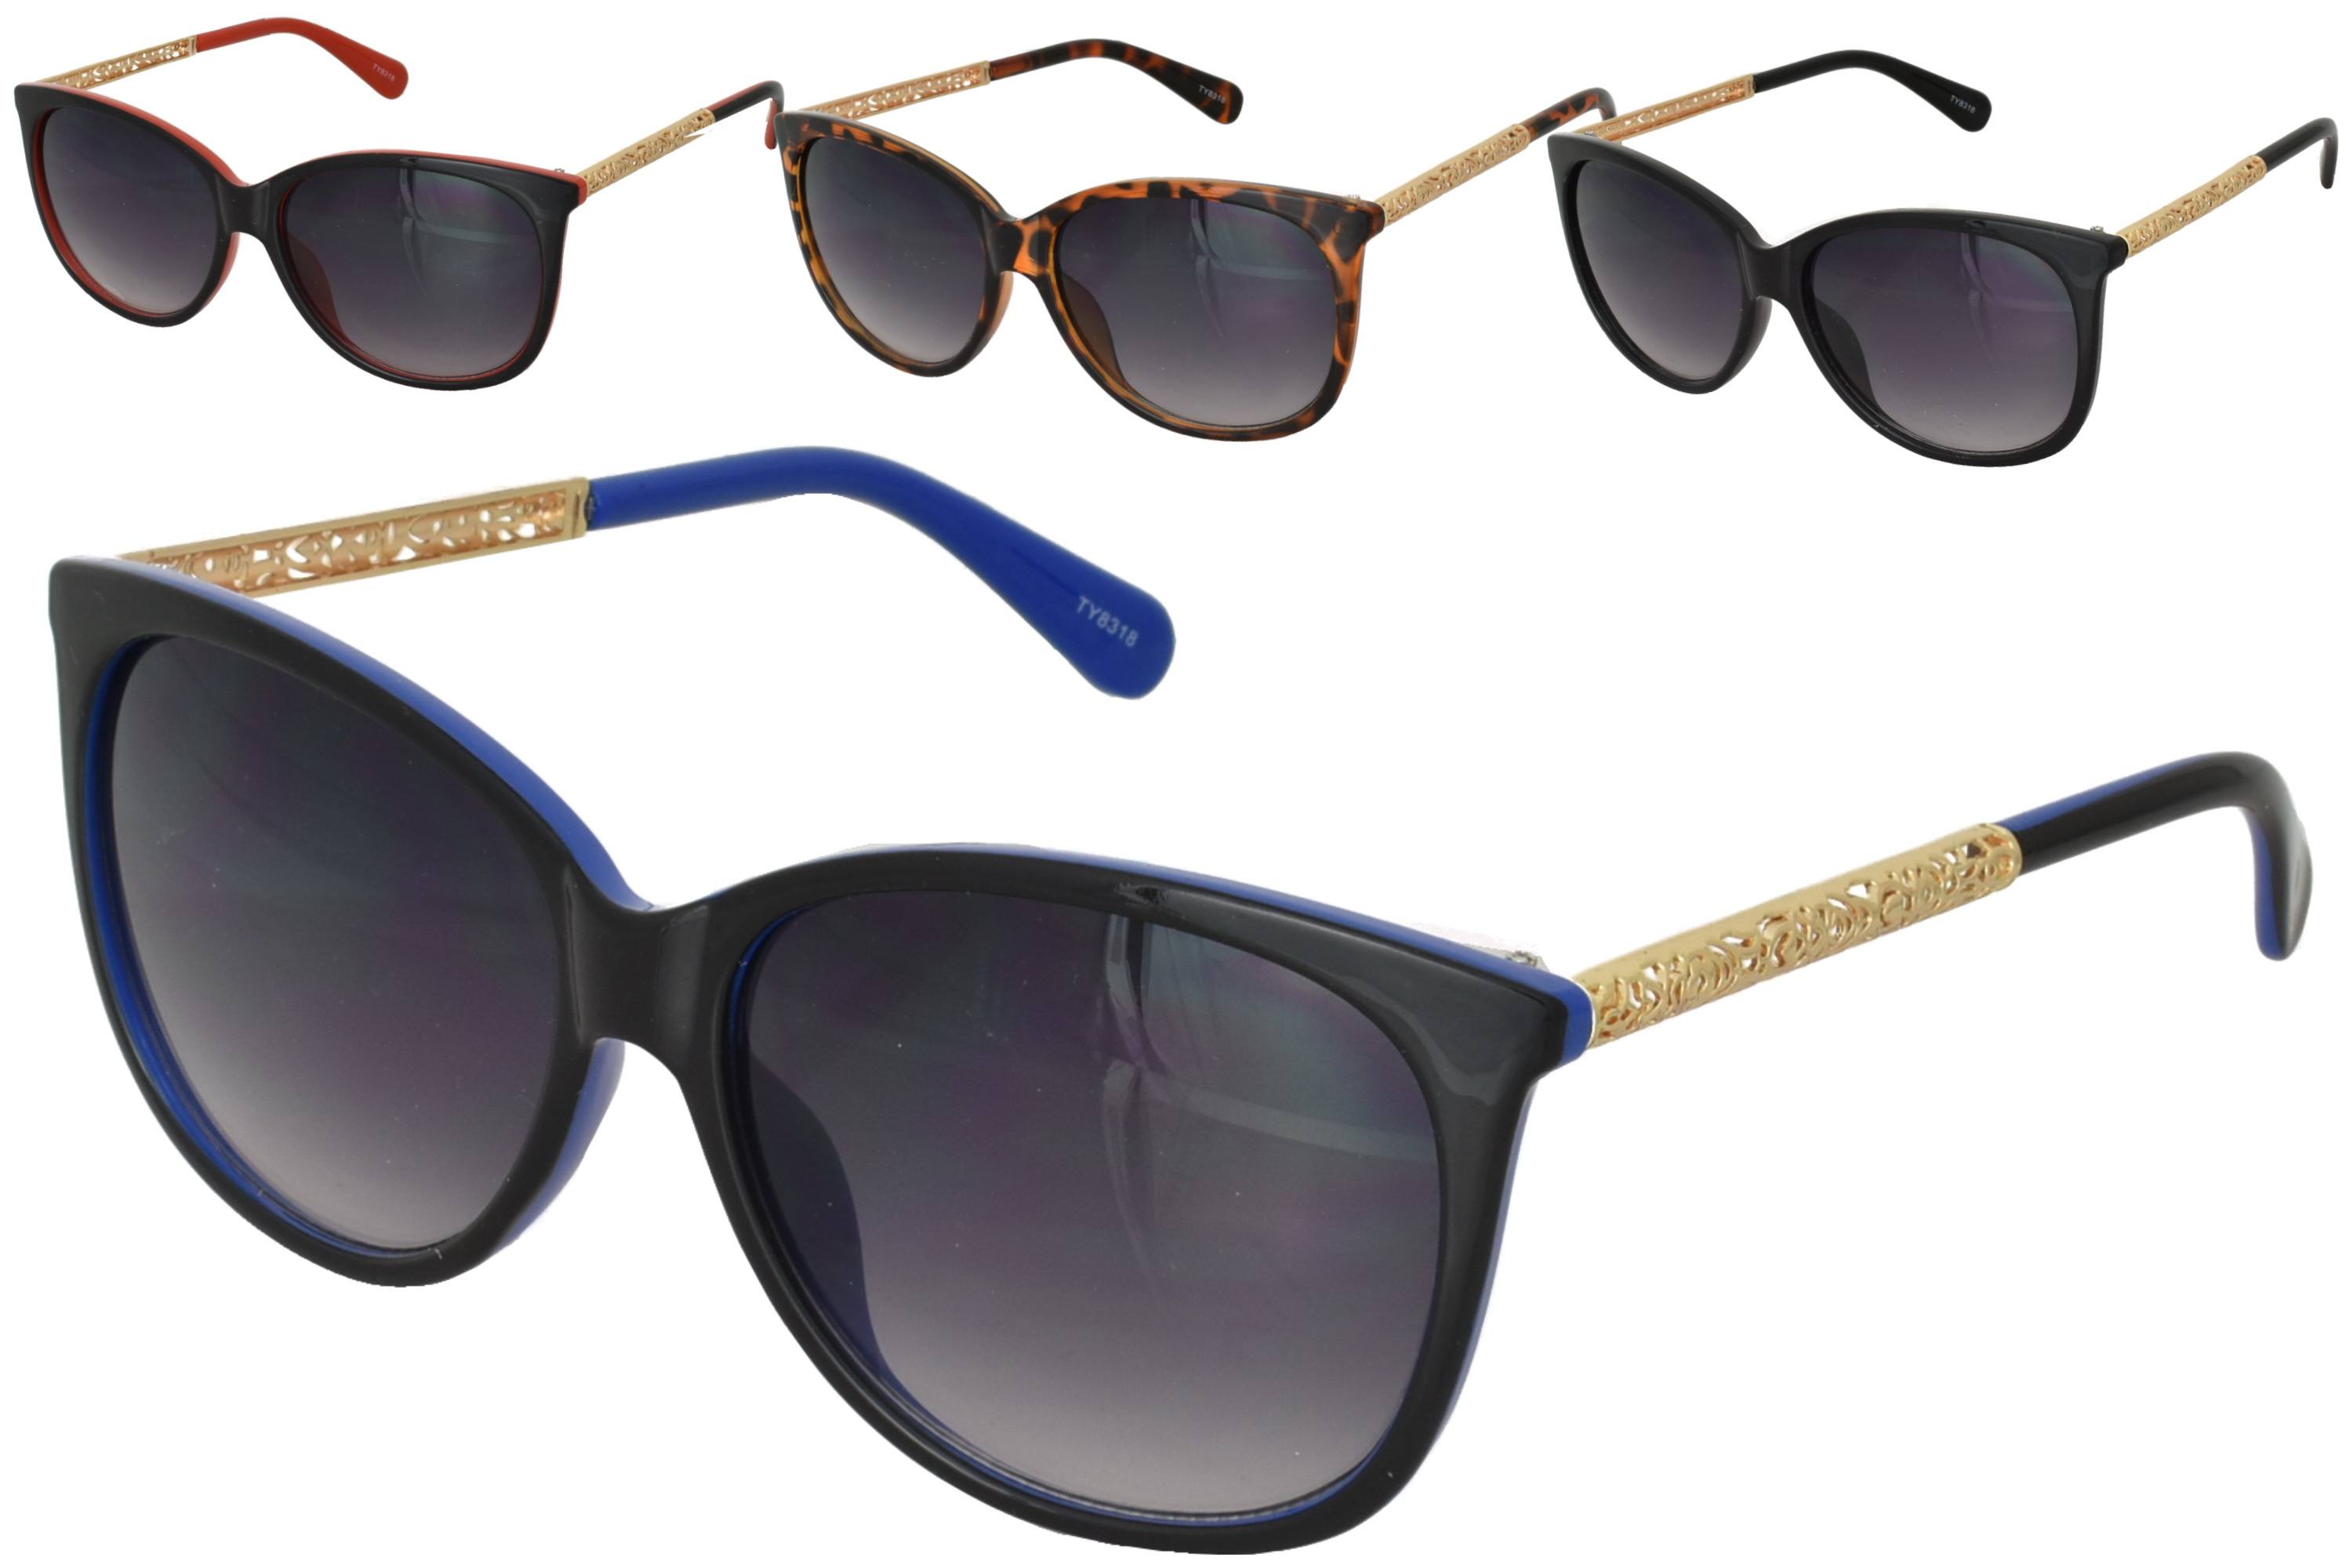 Adult 2 Tone Plastic Frame Sunglasses - 4 Assorted